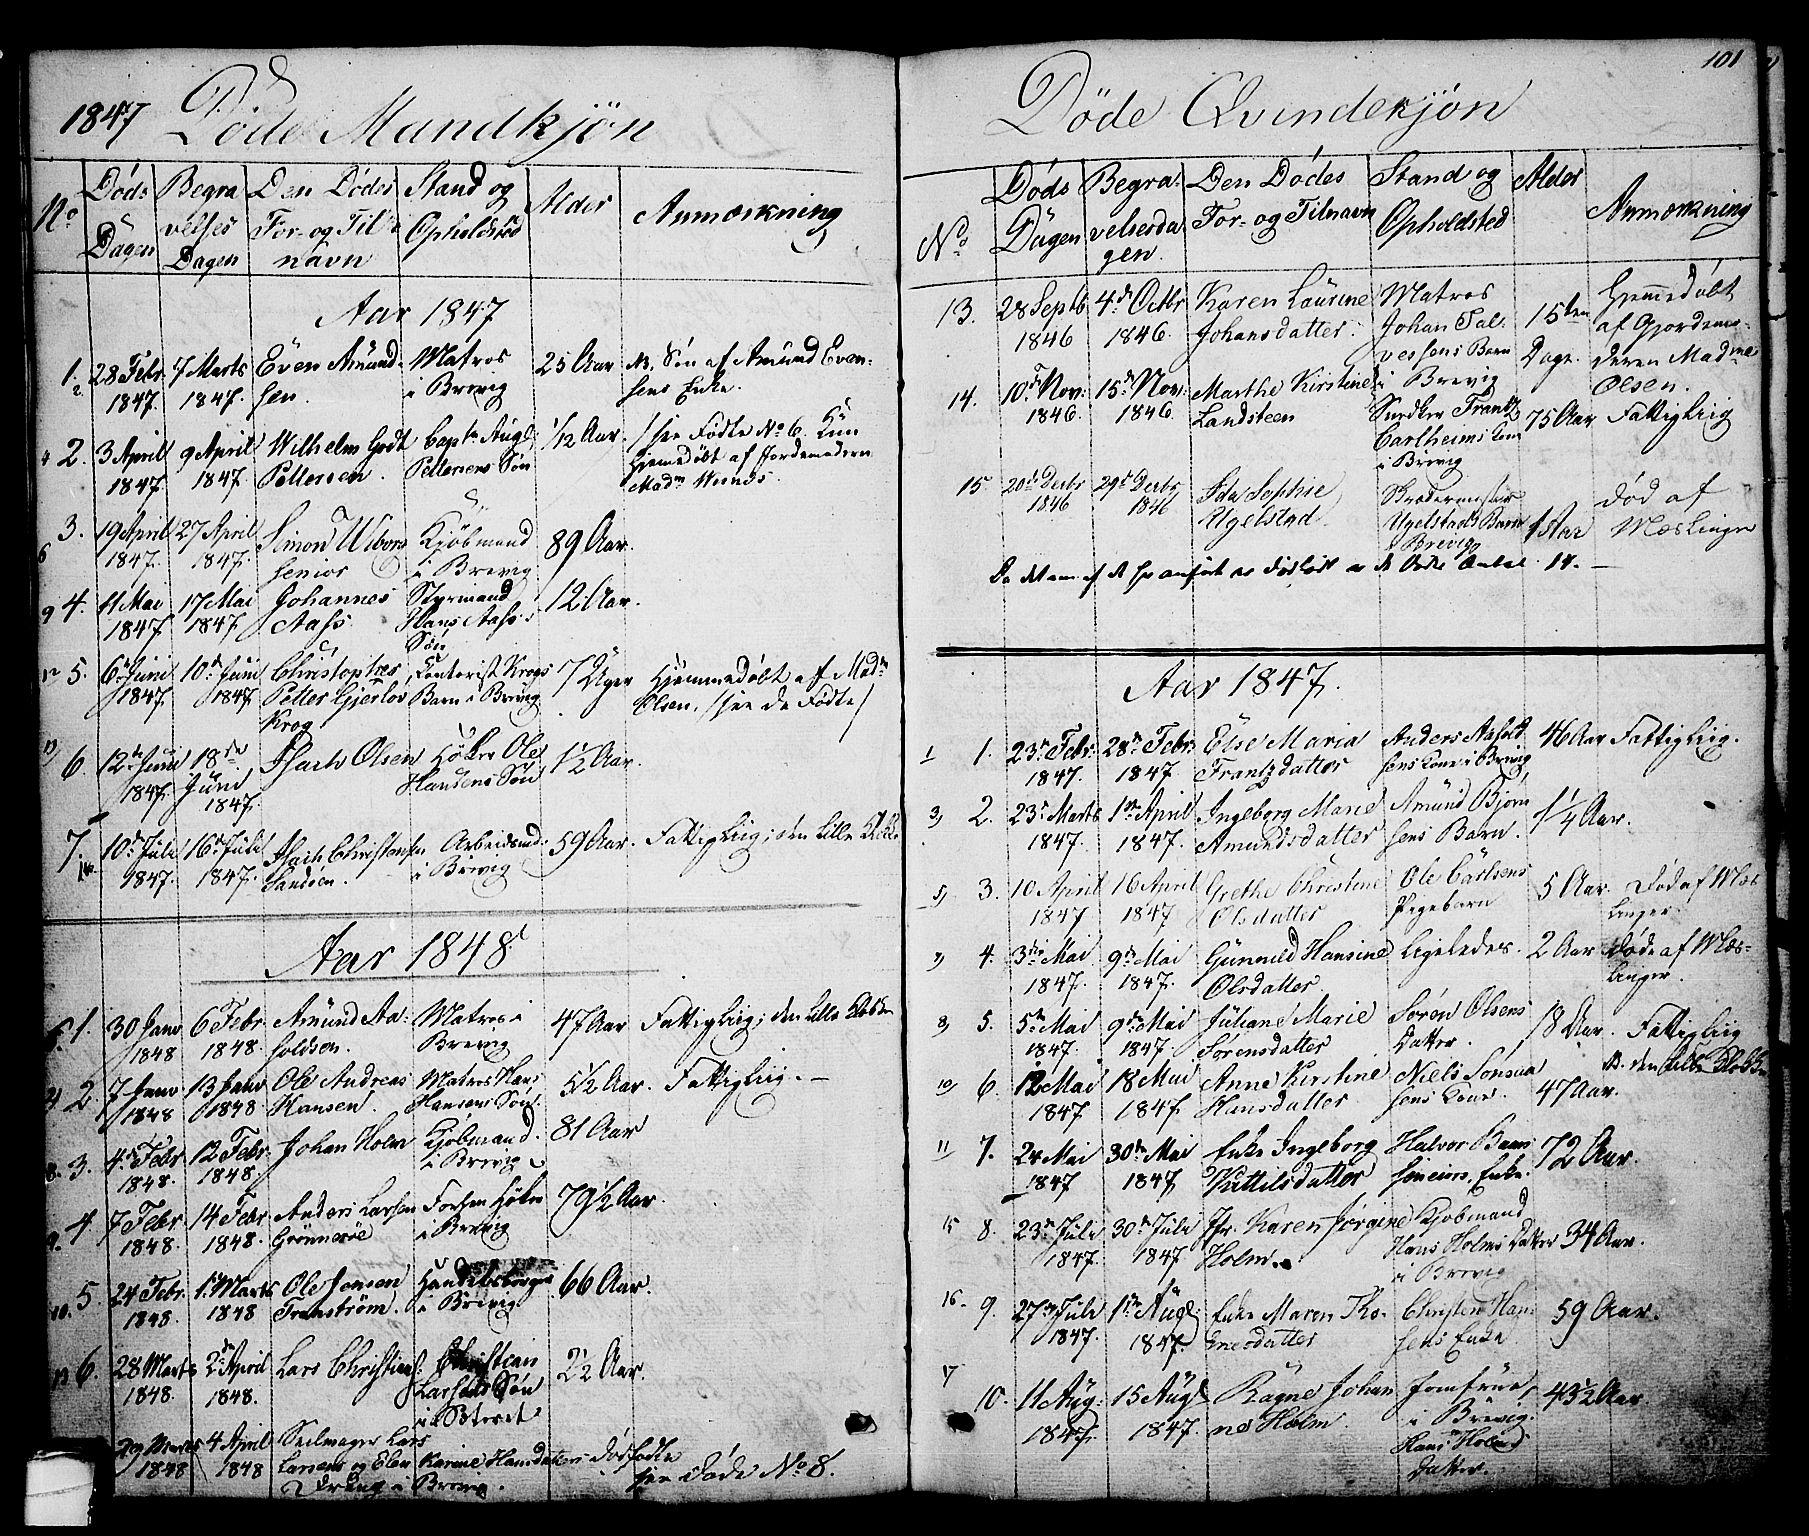 SAKO, Brevik kirkebøker, G/Ga/L0002: Klokkerbok nr. 2, 1846-1865, s. 101